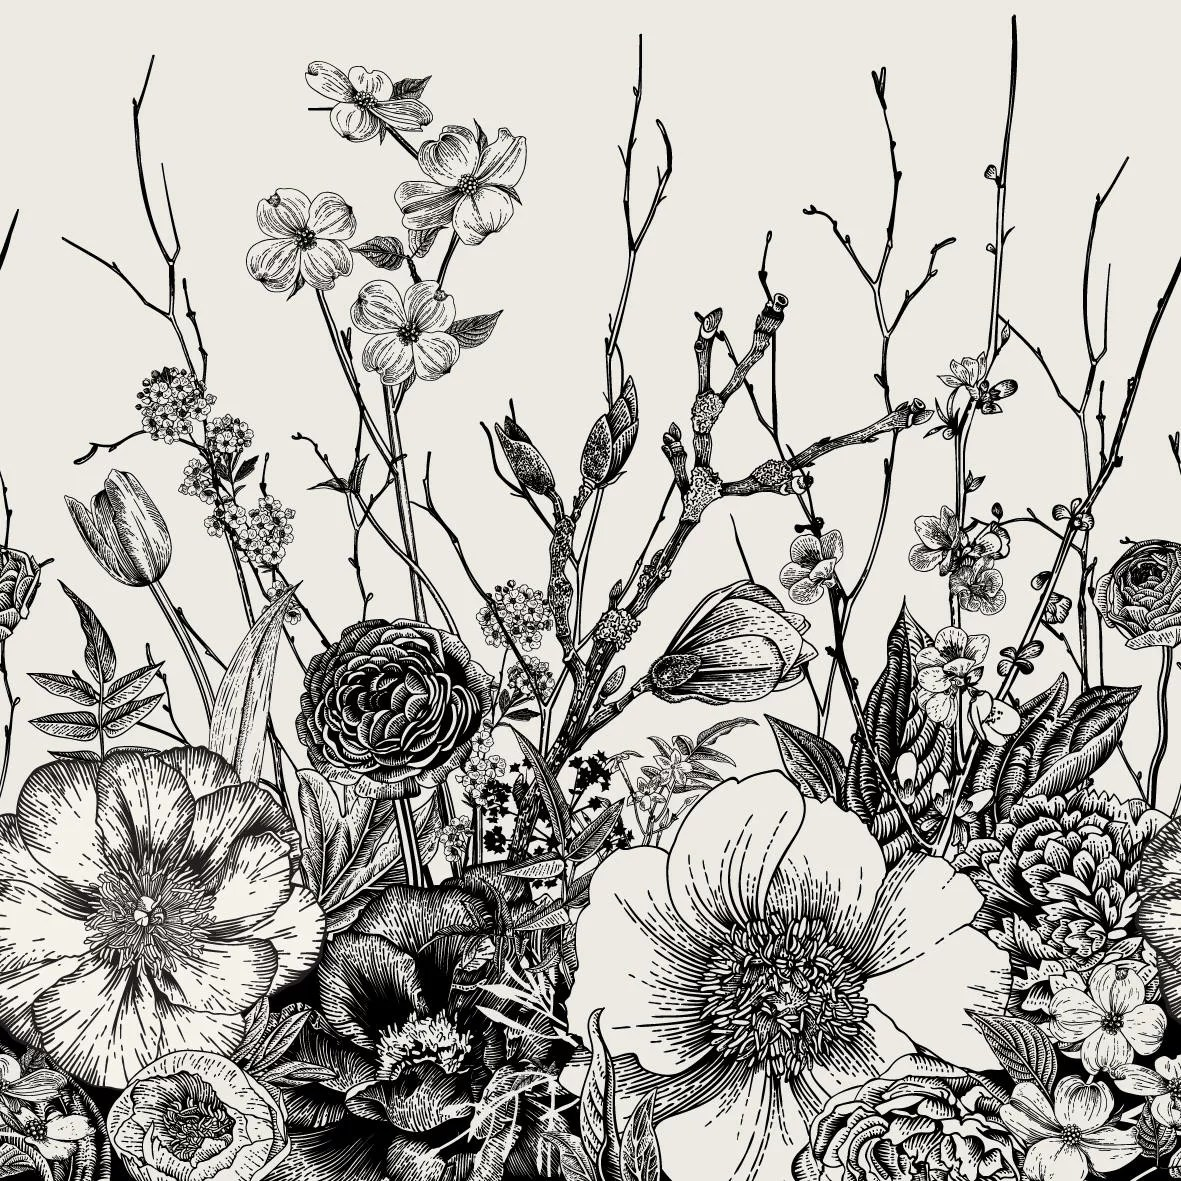 Bungalow Rose Lenworth Removable Vintage Floral Mix 4 17 L X 50 W Peel And Stick Wallpaper Roll Wayfair